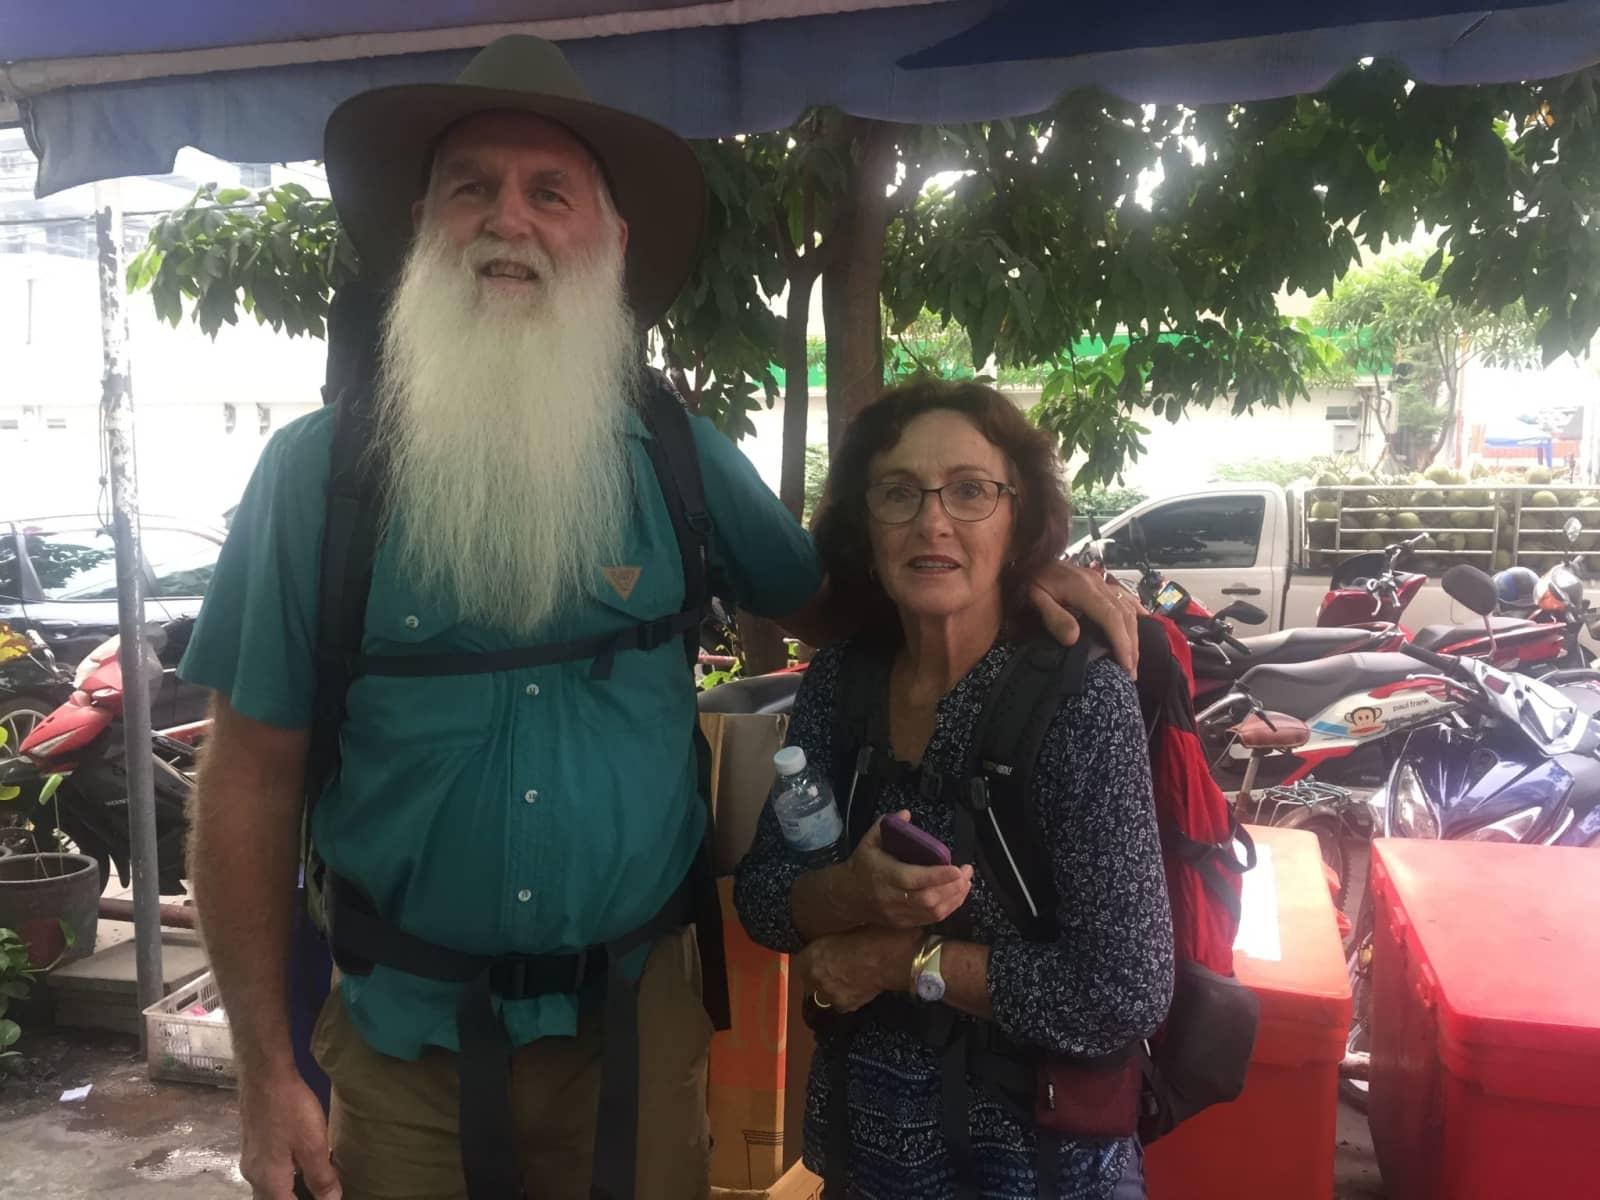 Stephen & Monica from St Helens, Tasmania, Australia